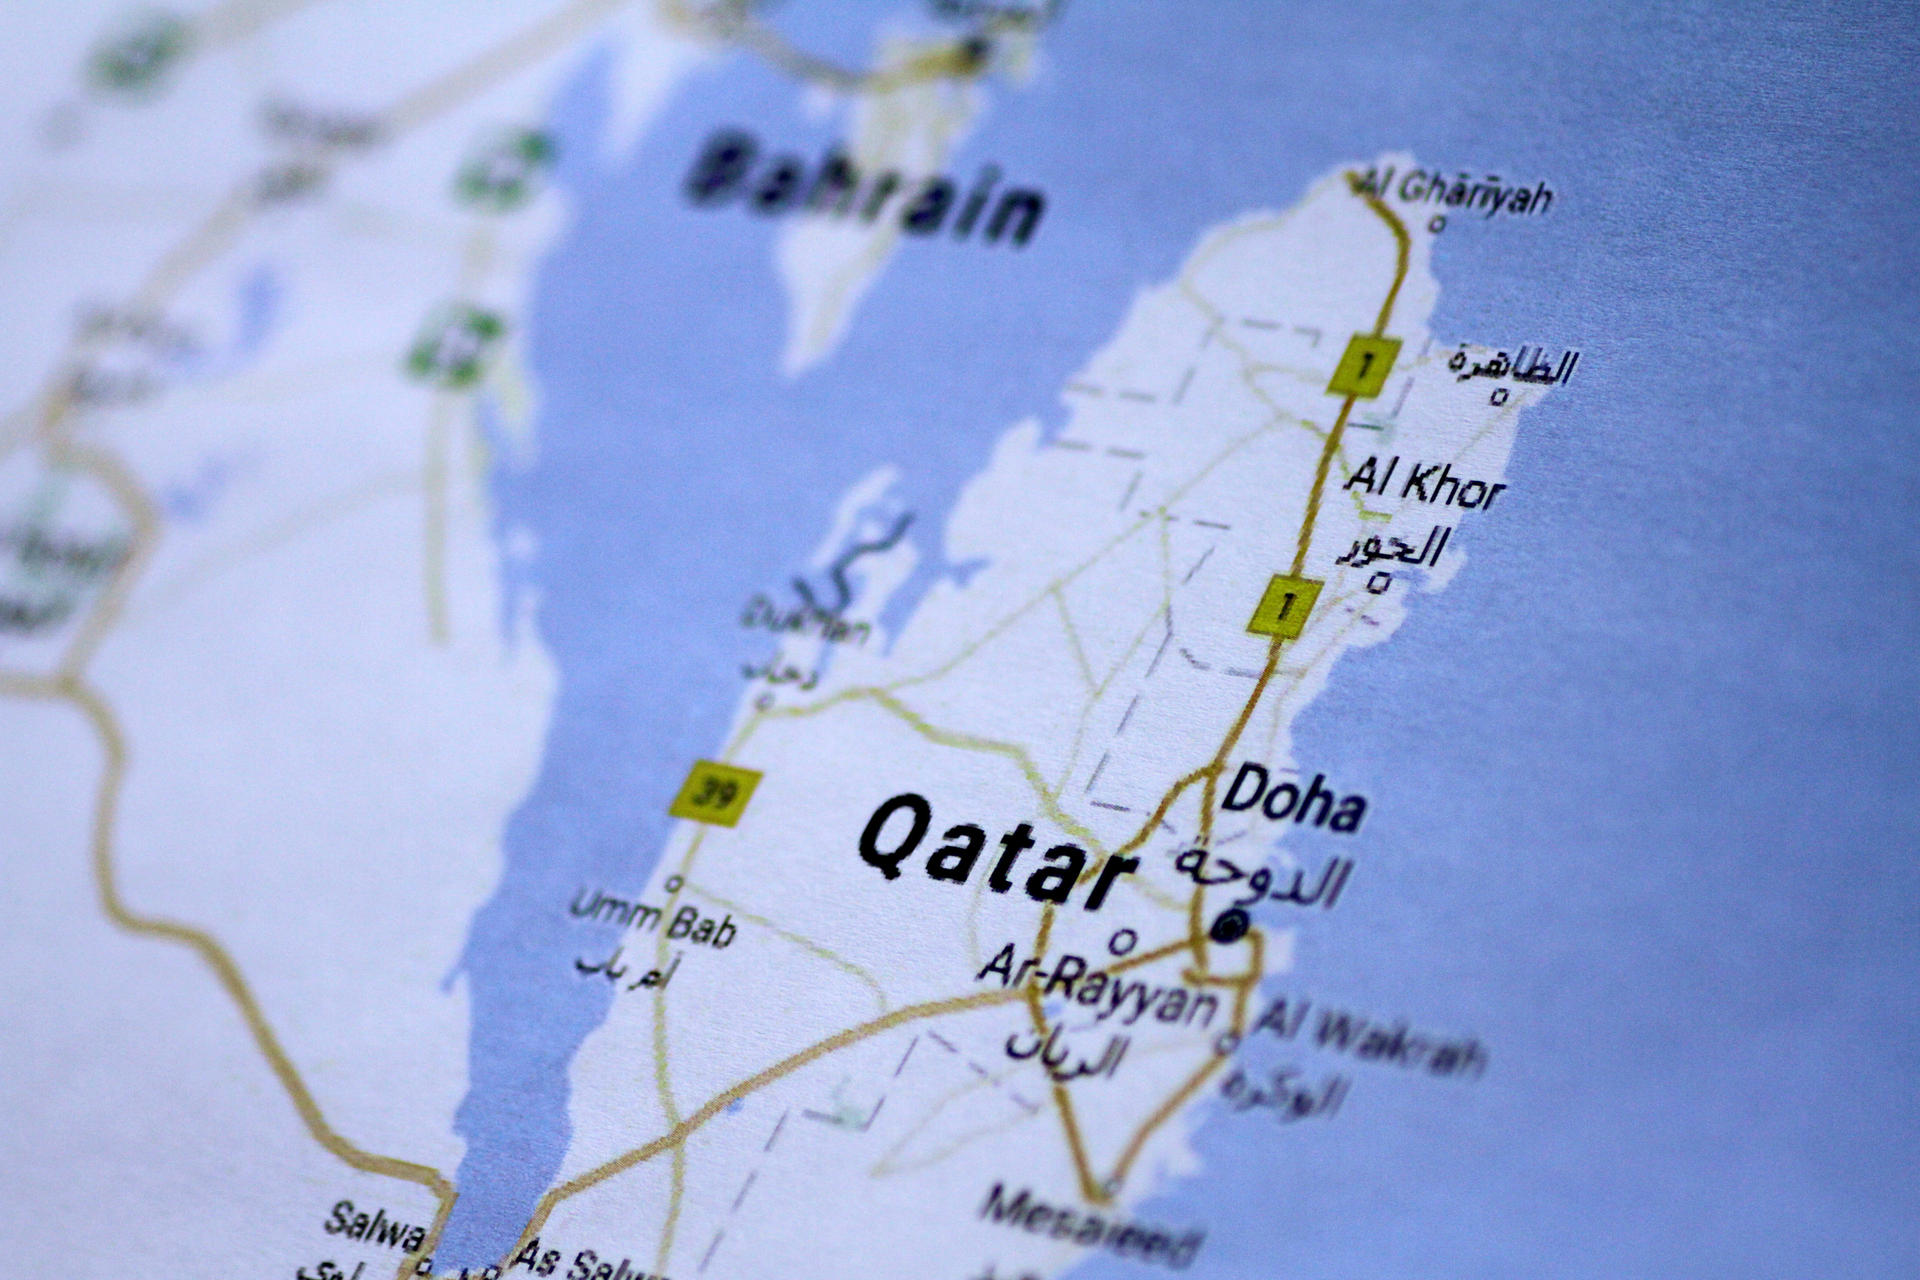 Gulf Crisis Set to Escalate, Gulf Crisis Set to Escalate